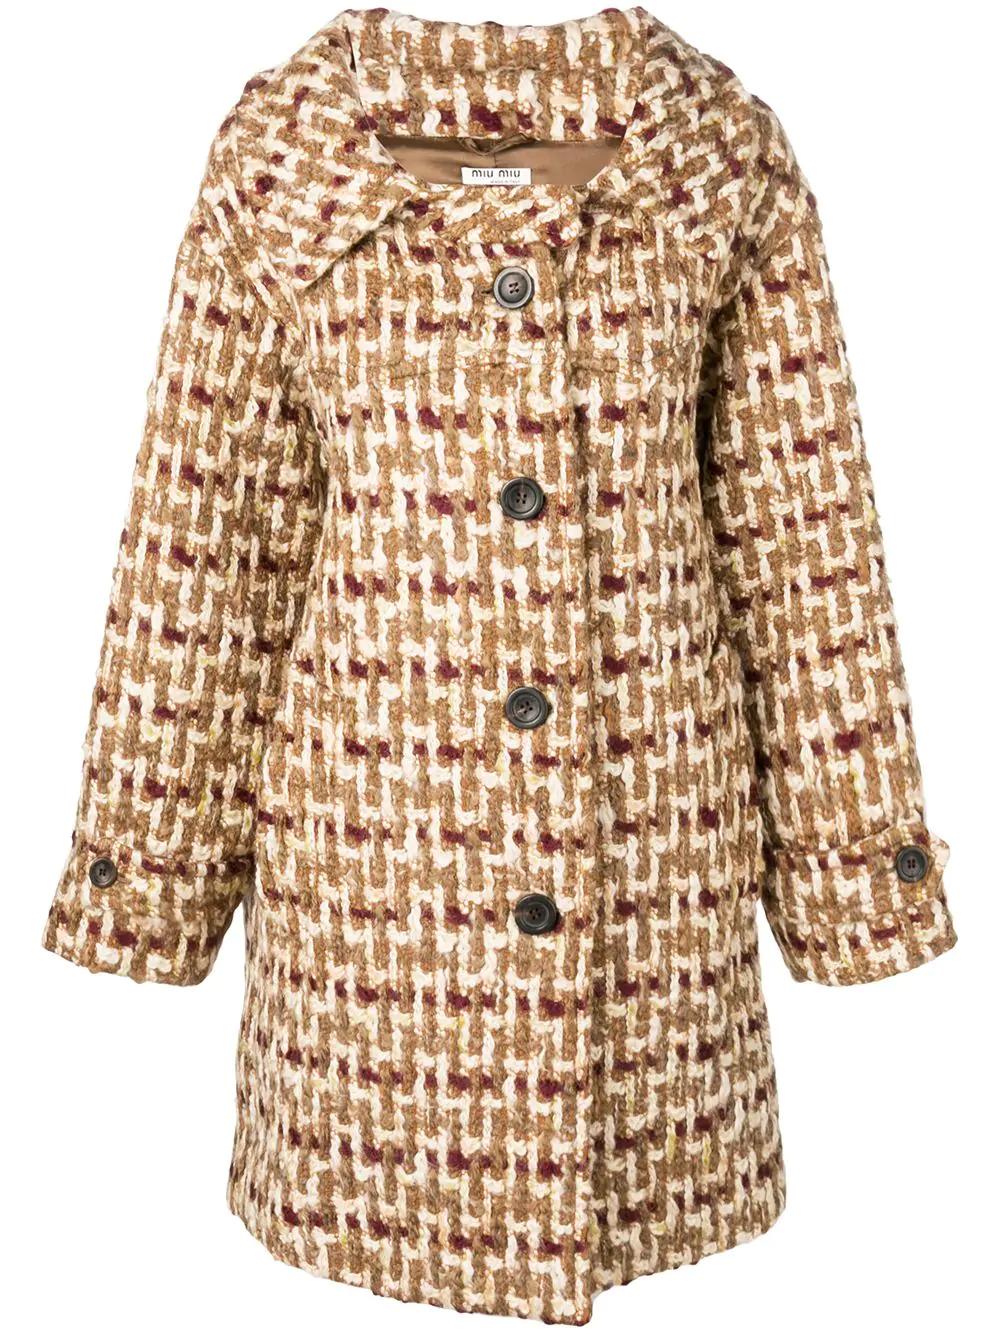 Miu Miu Embroidered Single-breasted Coat - Neutrals